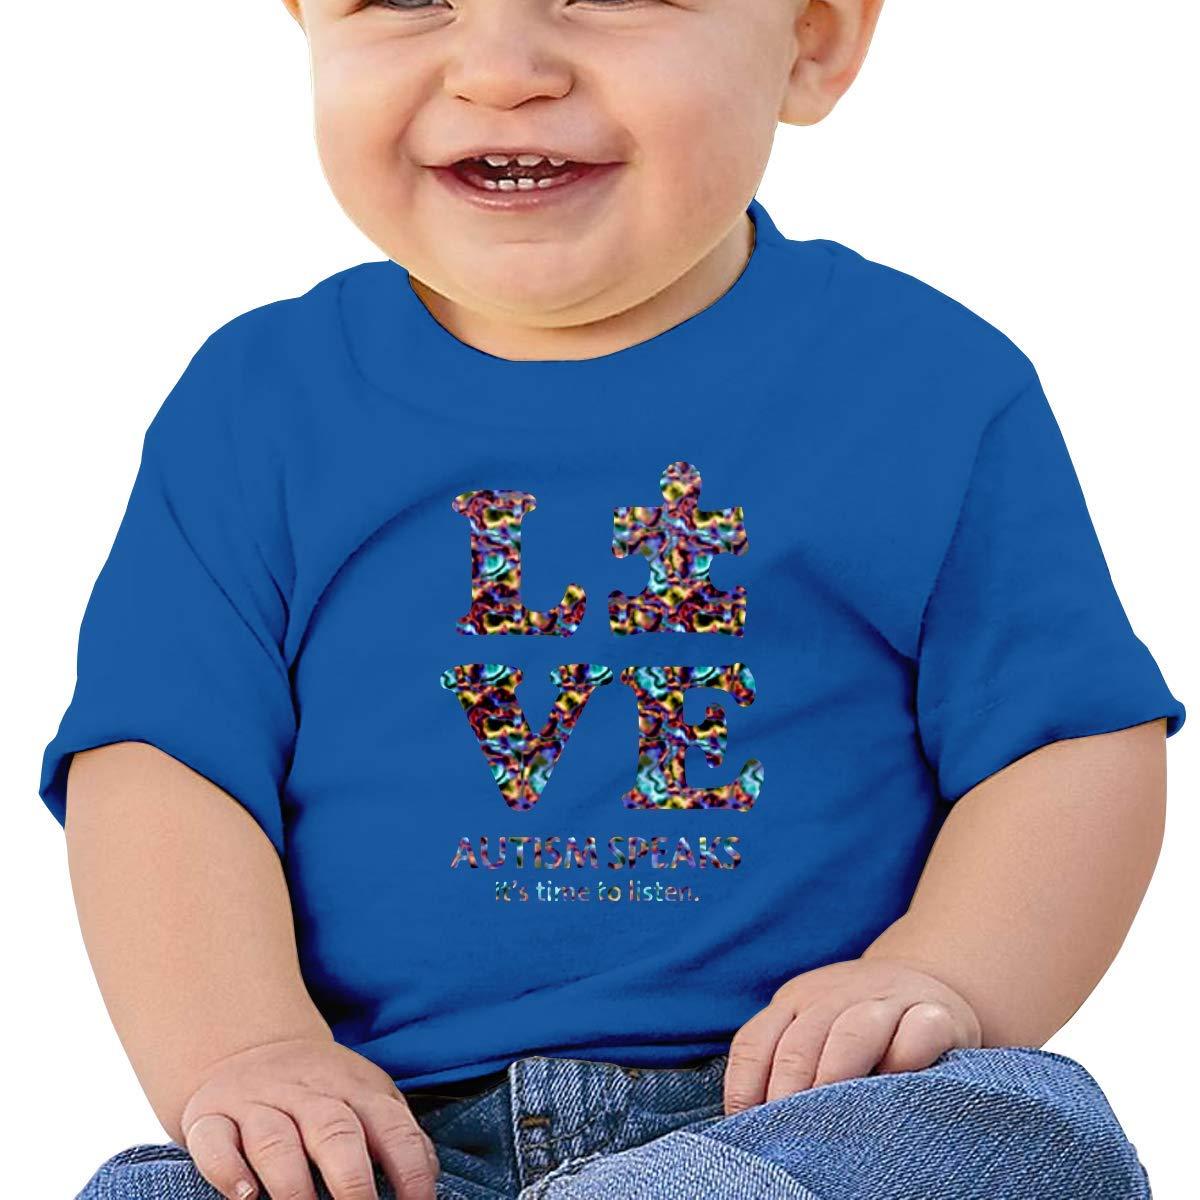 ZhuHanug Dachshund Funny Baby Boys Girls Short Sleeve Crew Neck T-Shirt